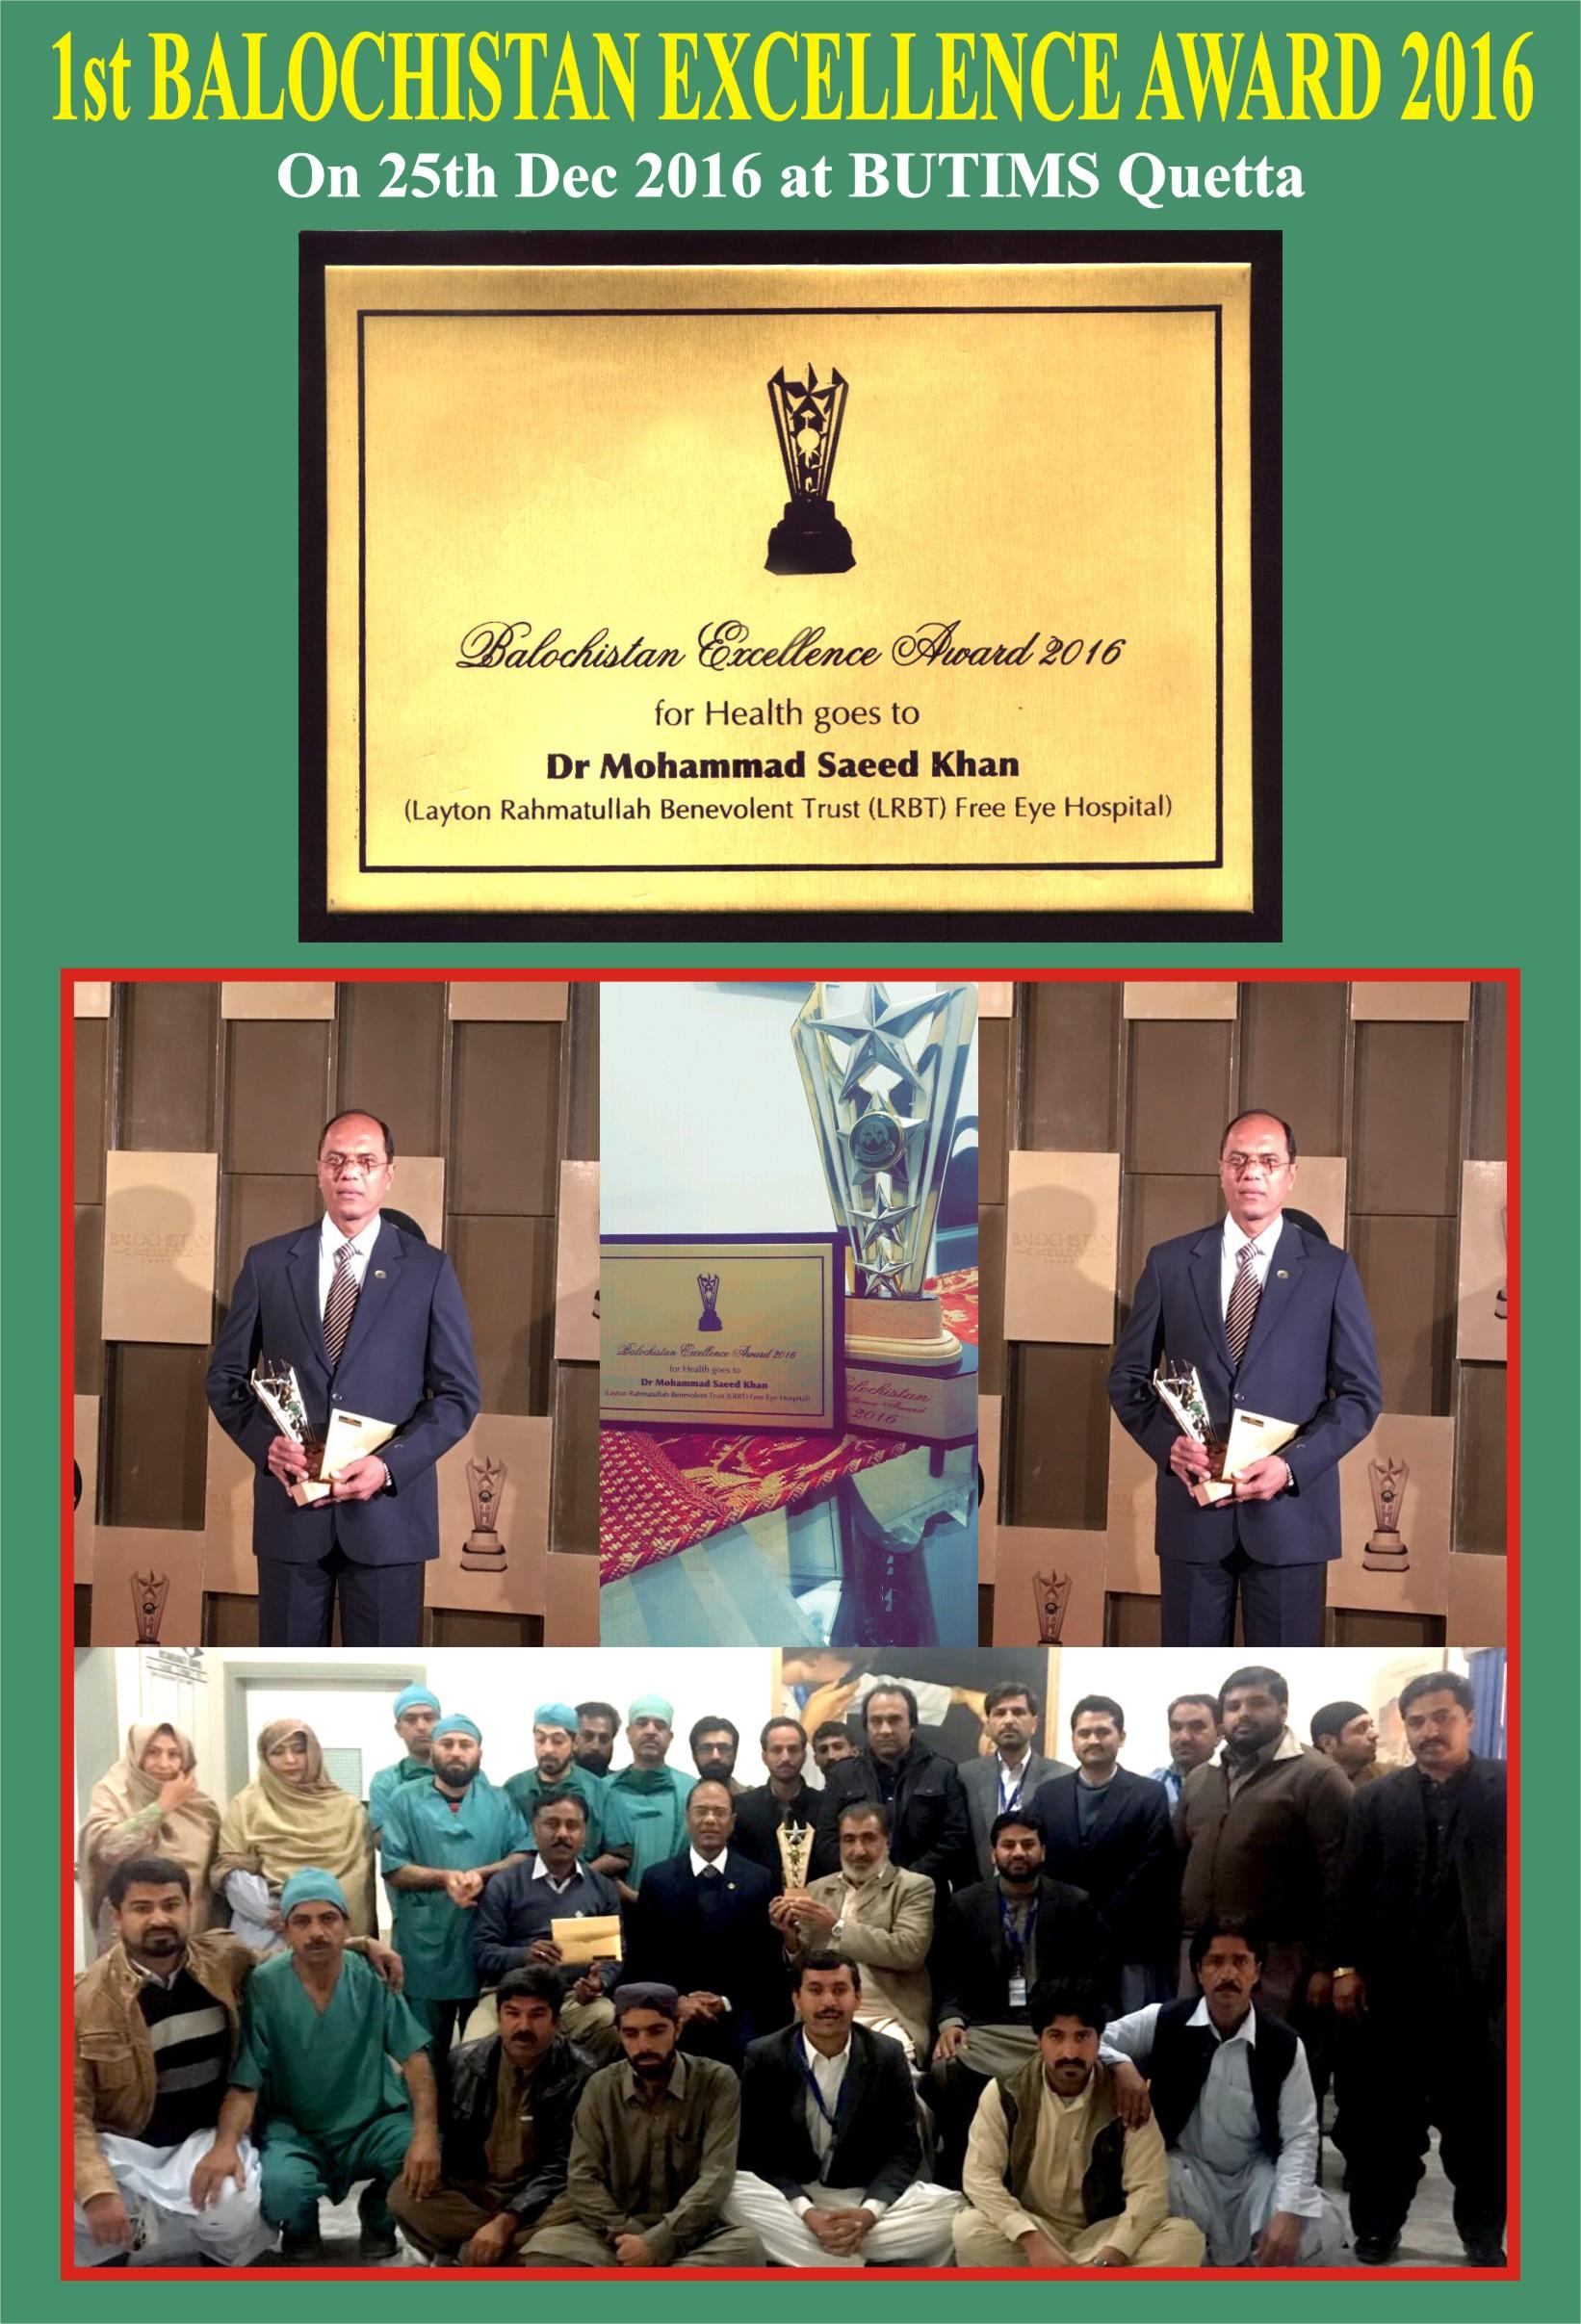 Dr. M Saeed Khan Balochistan Excellence award 2016